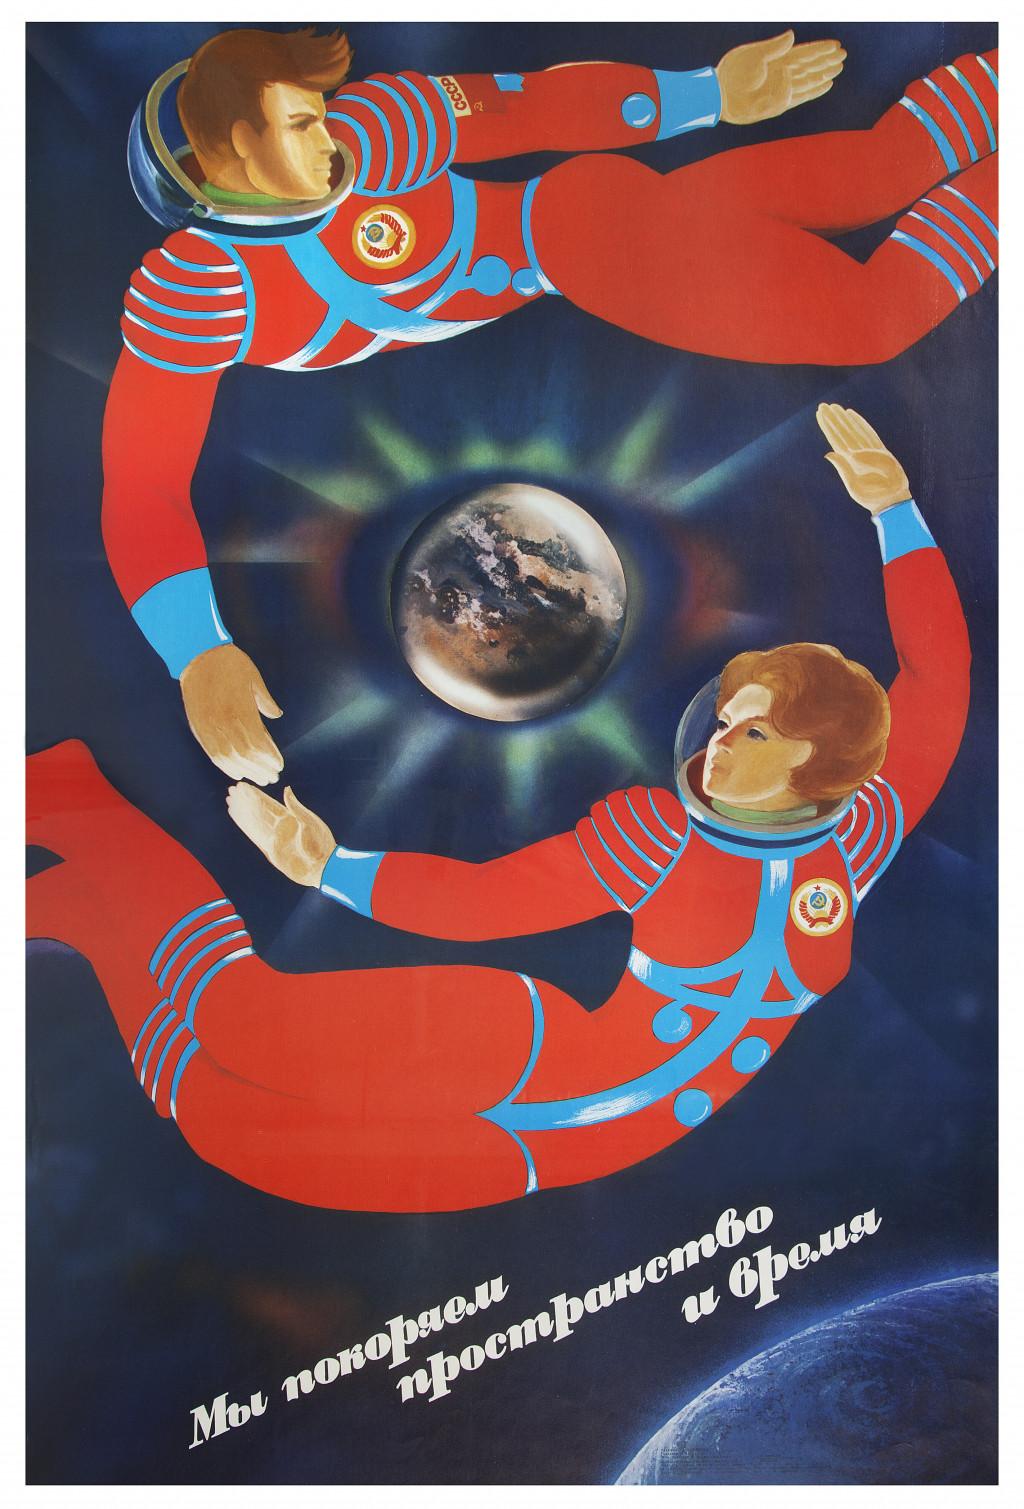 Lyudmila Tarasova, My pokoryaem prostranstvo i vremya (We veroveren ruimte en tijd), 1983. Collectie Stedelijk Museum Amsterdam